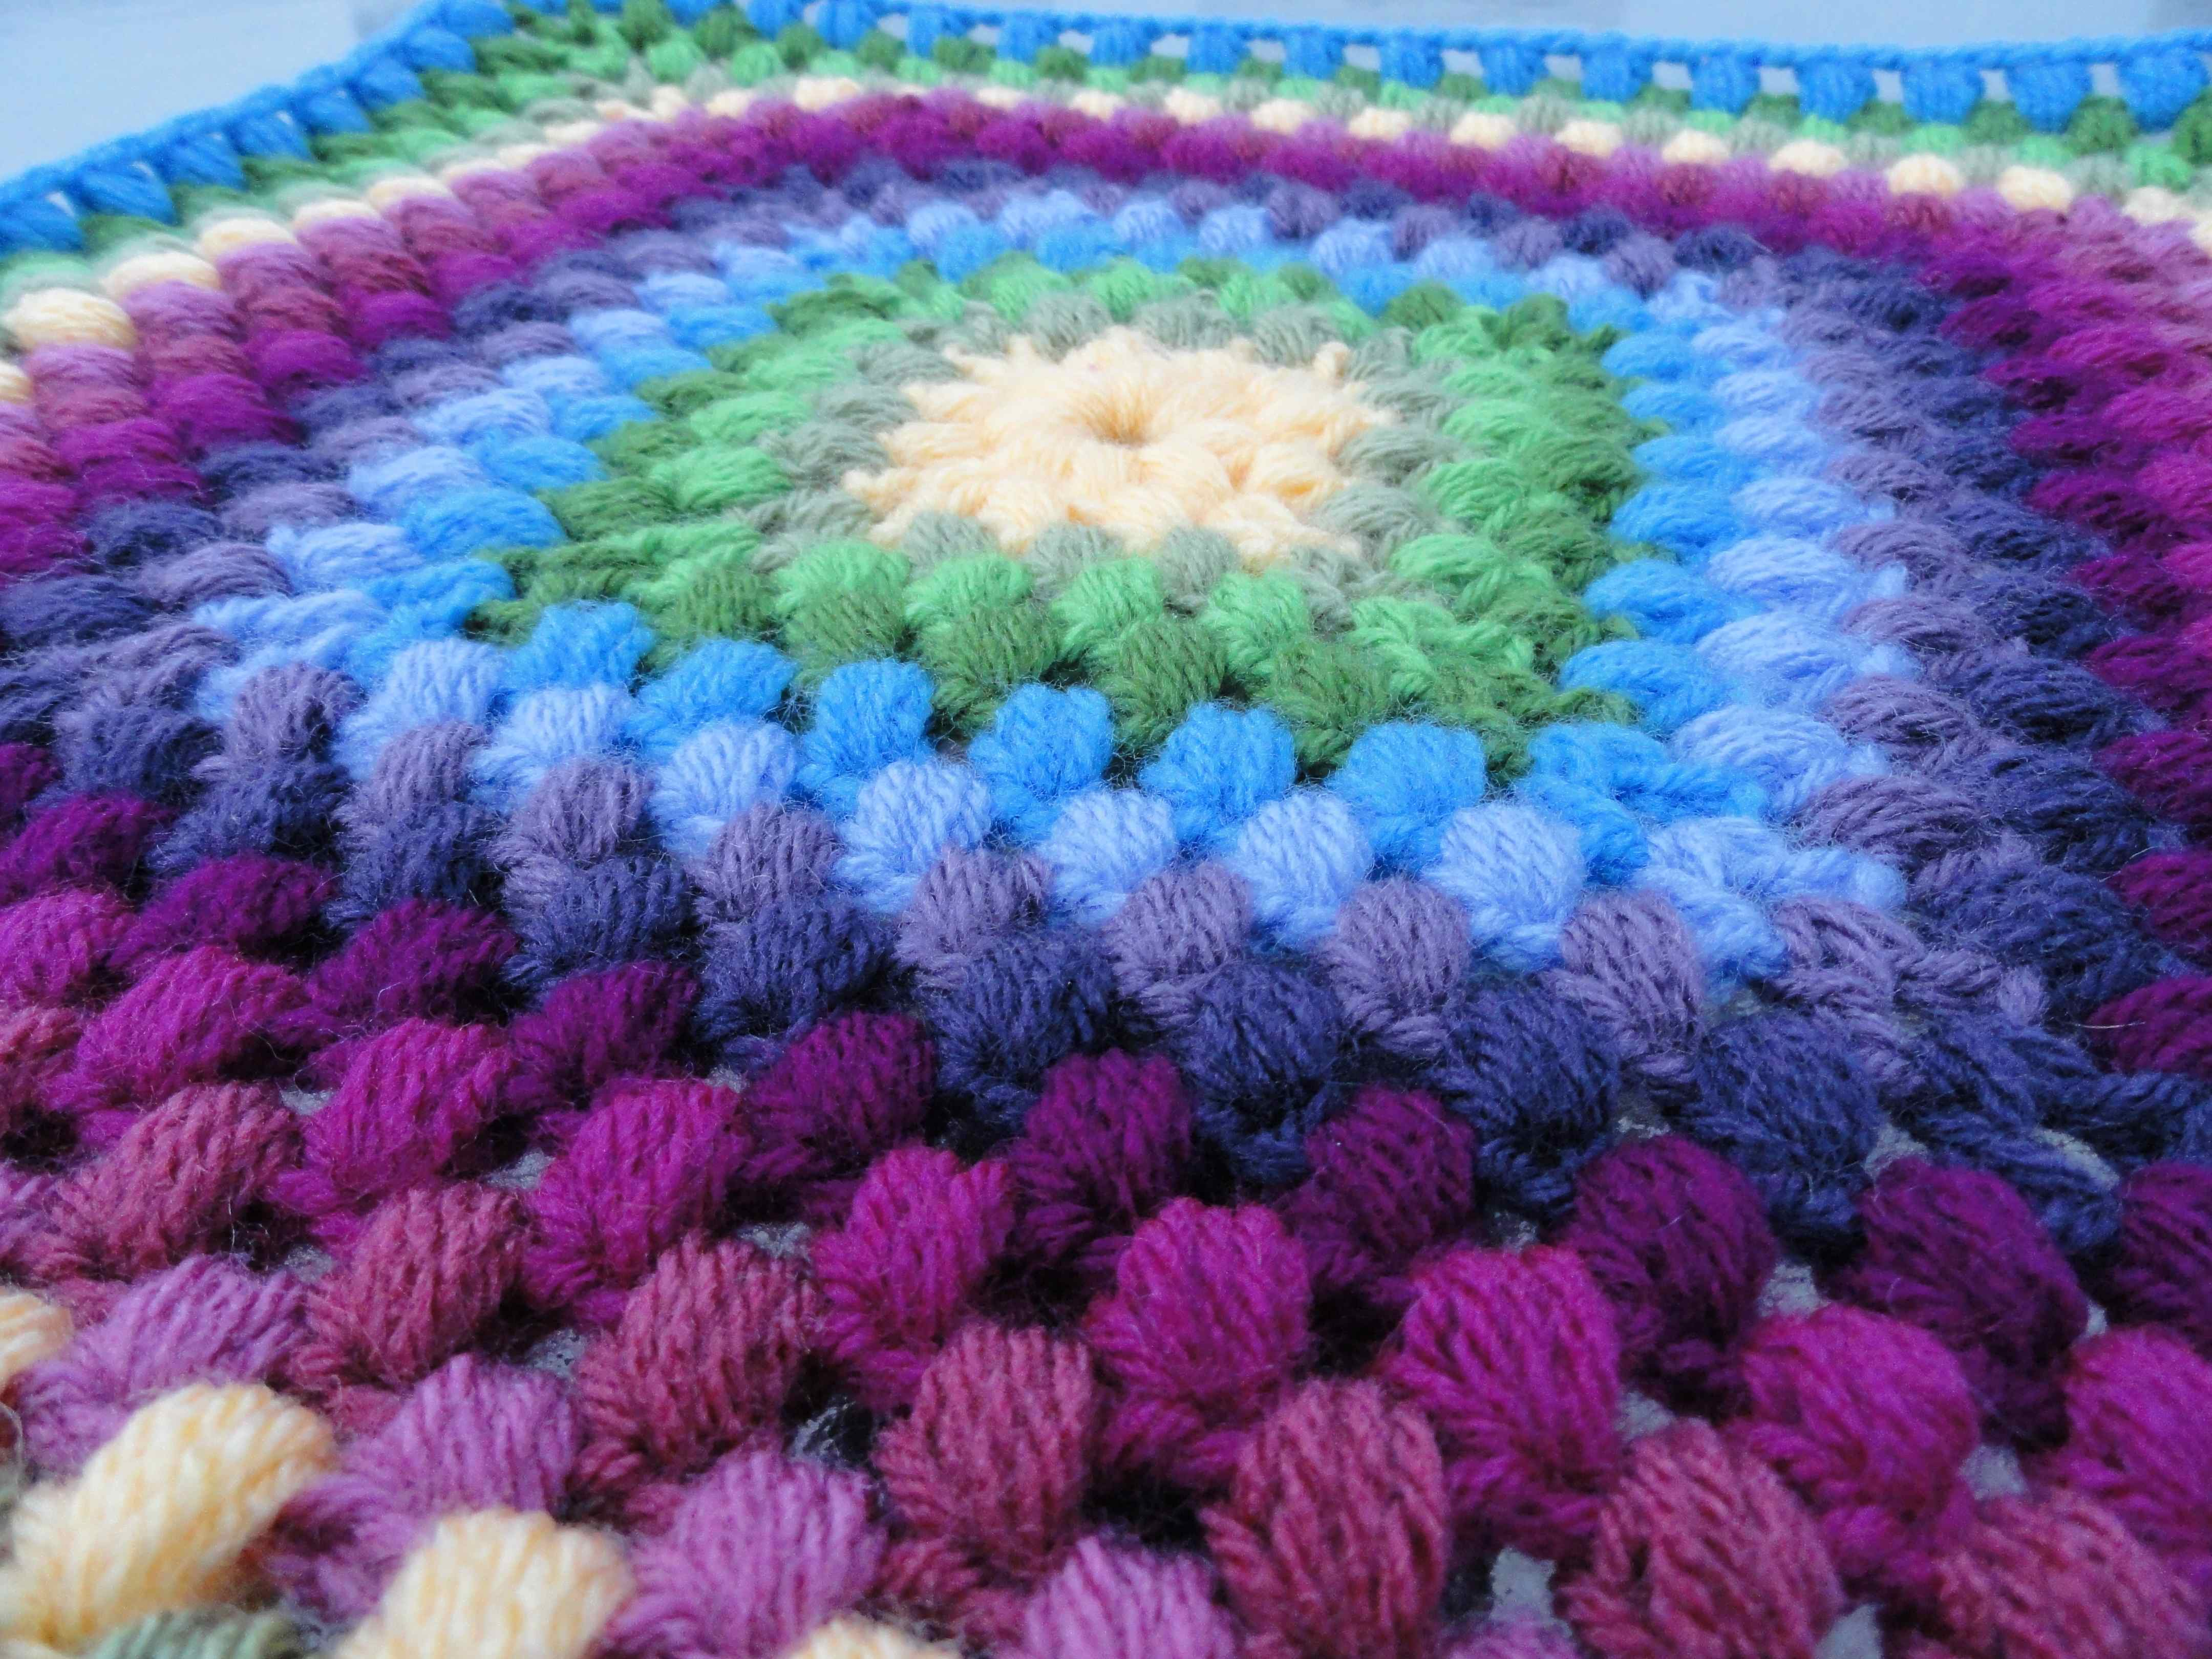 Granny Square Crochet Pattern : crochet:: hawaiian granny square pattern yarnchick40